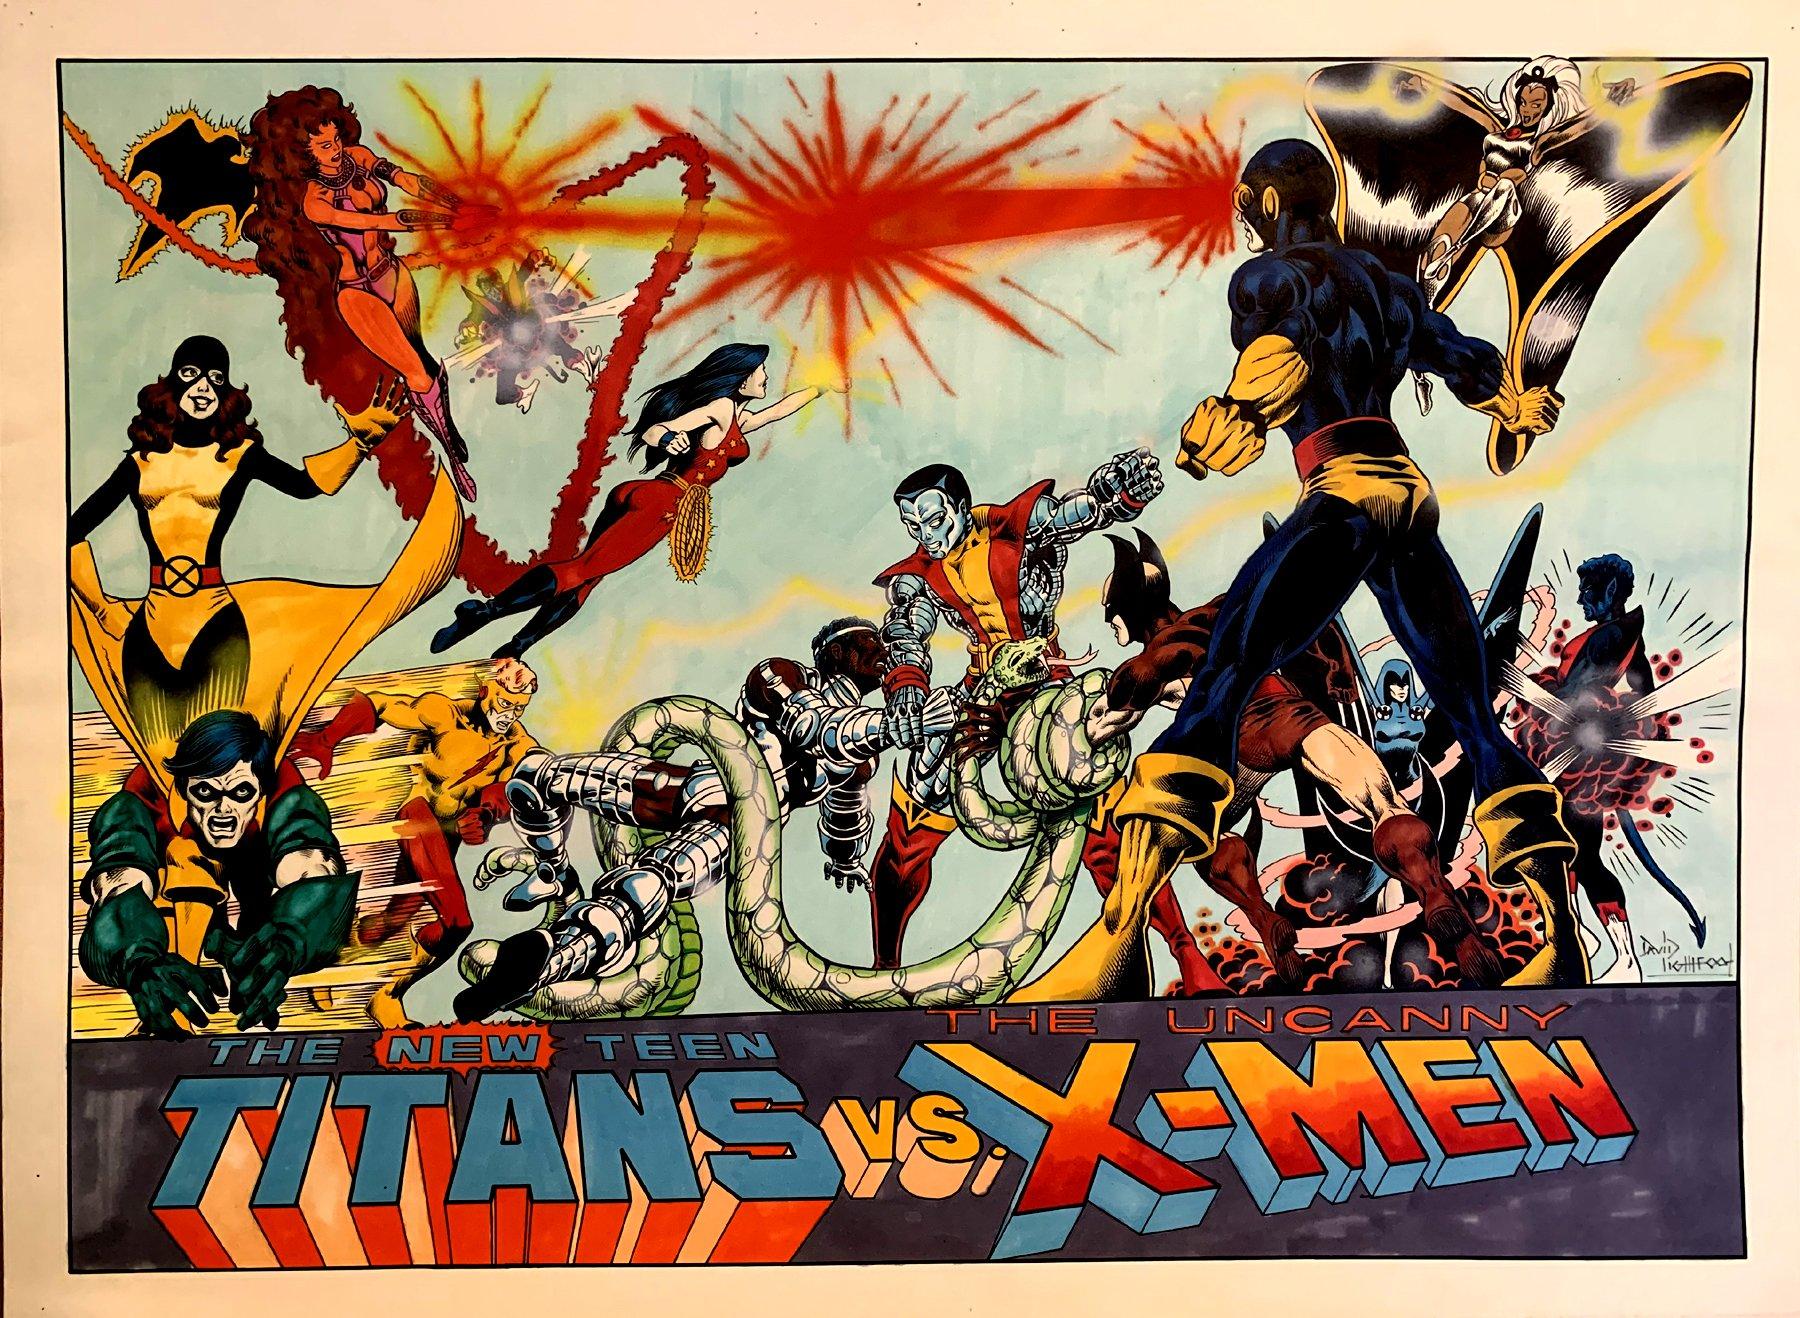 X-Men Vs Titans Huge Painting (SOLD LIVE ON 'DUELING DEALERS OF COMIC ART' EPISODE #37 PODCAST ON 9-22-2021